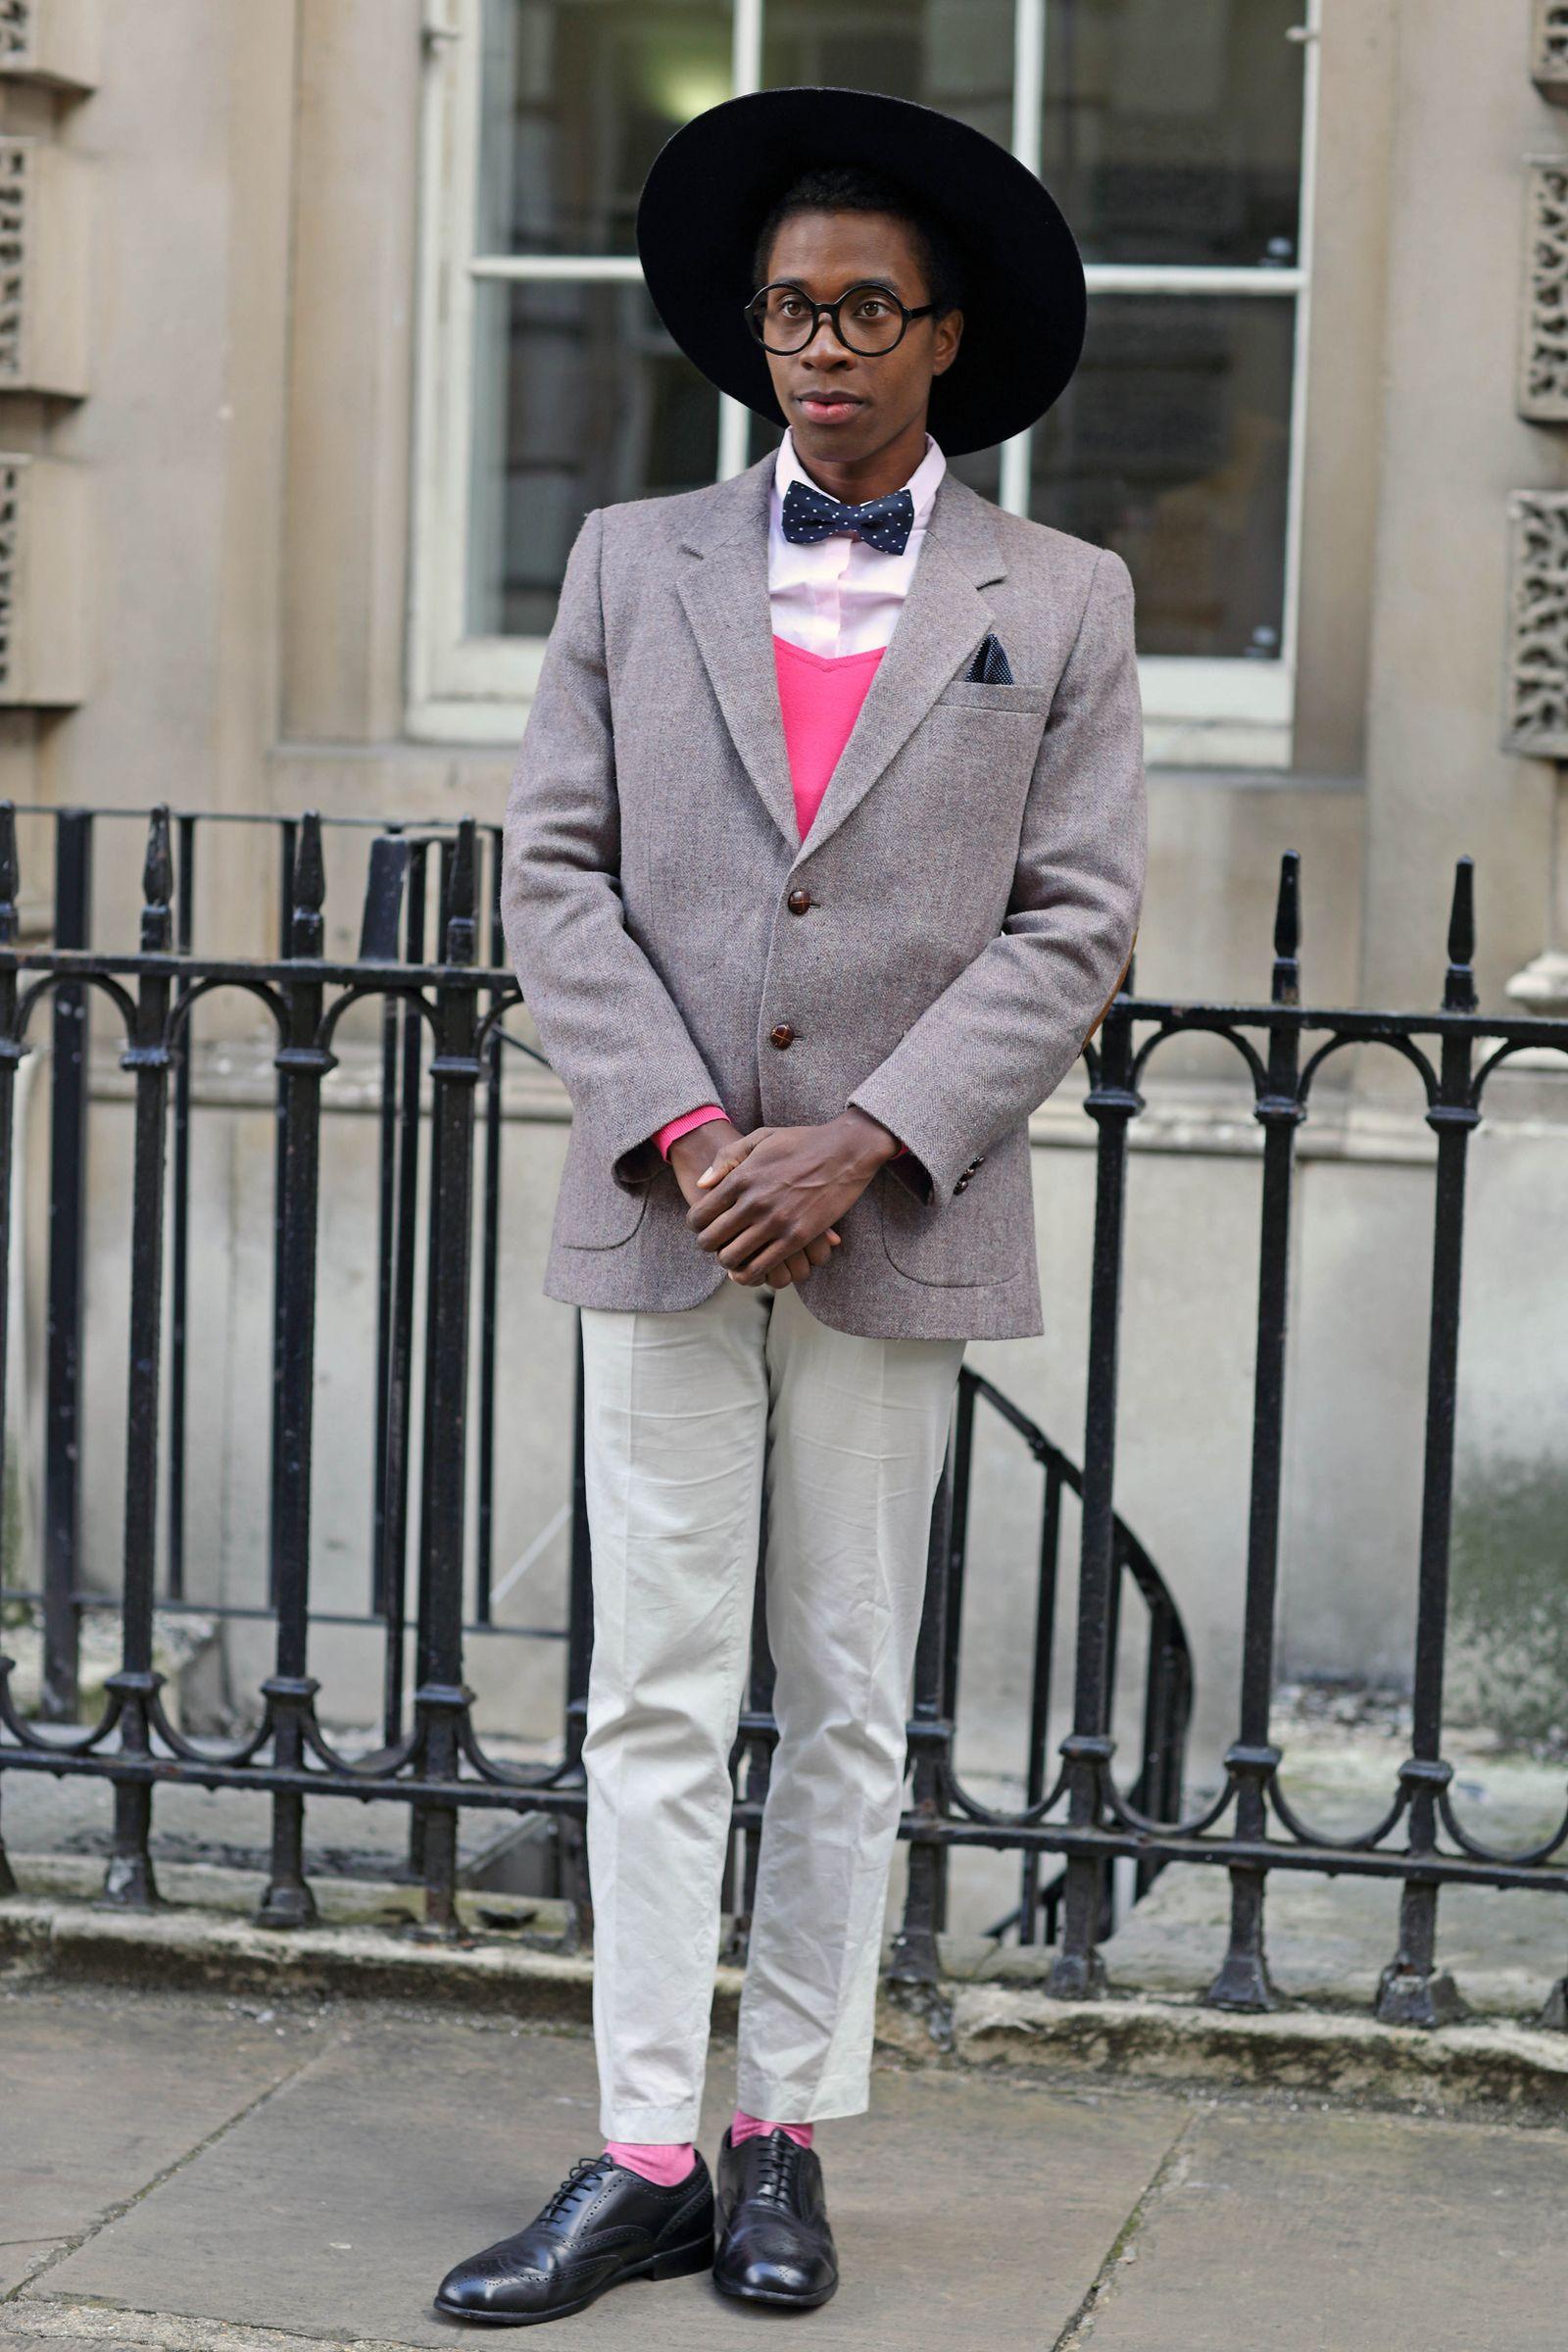 EINMALIGE VERWENDUNG Fashion London/ Fashion Week London/ Zion